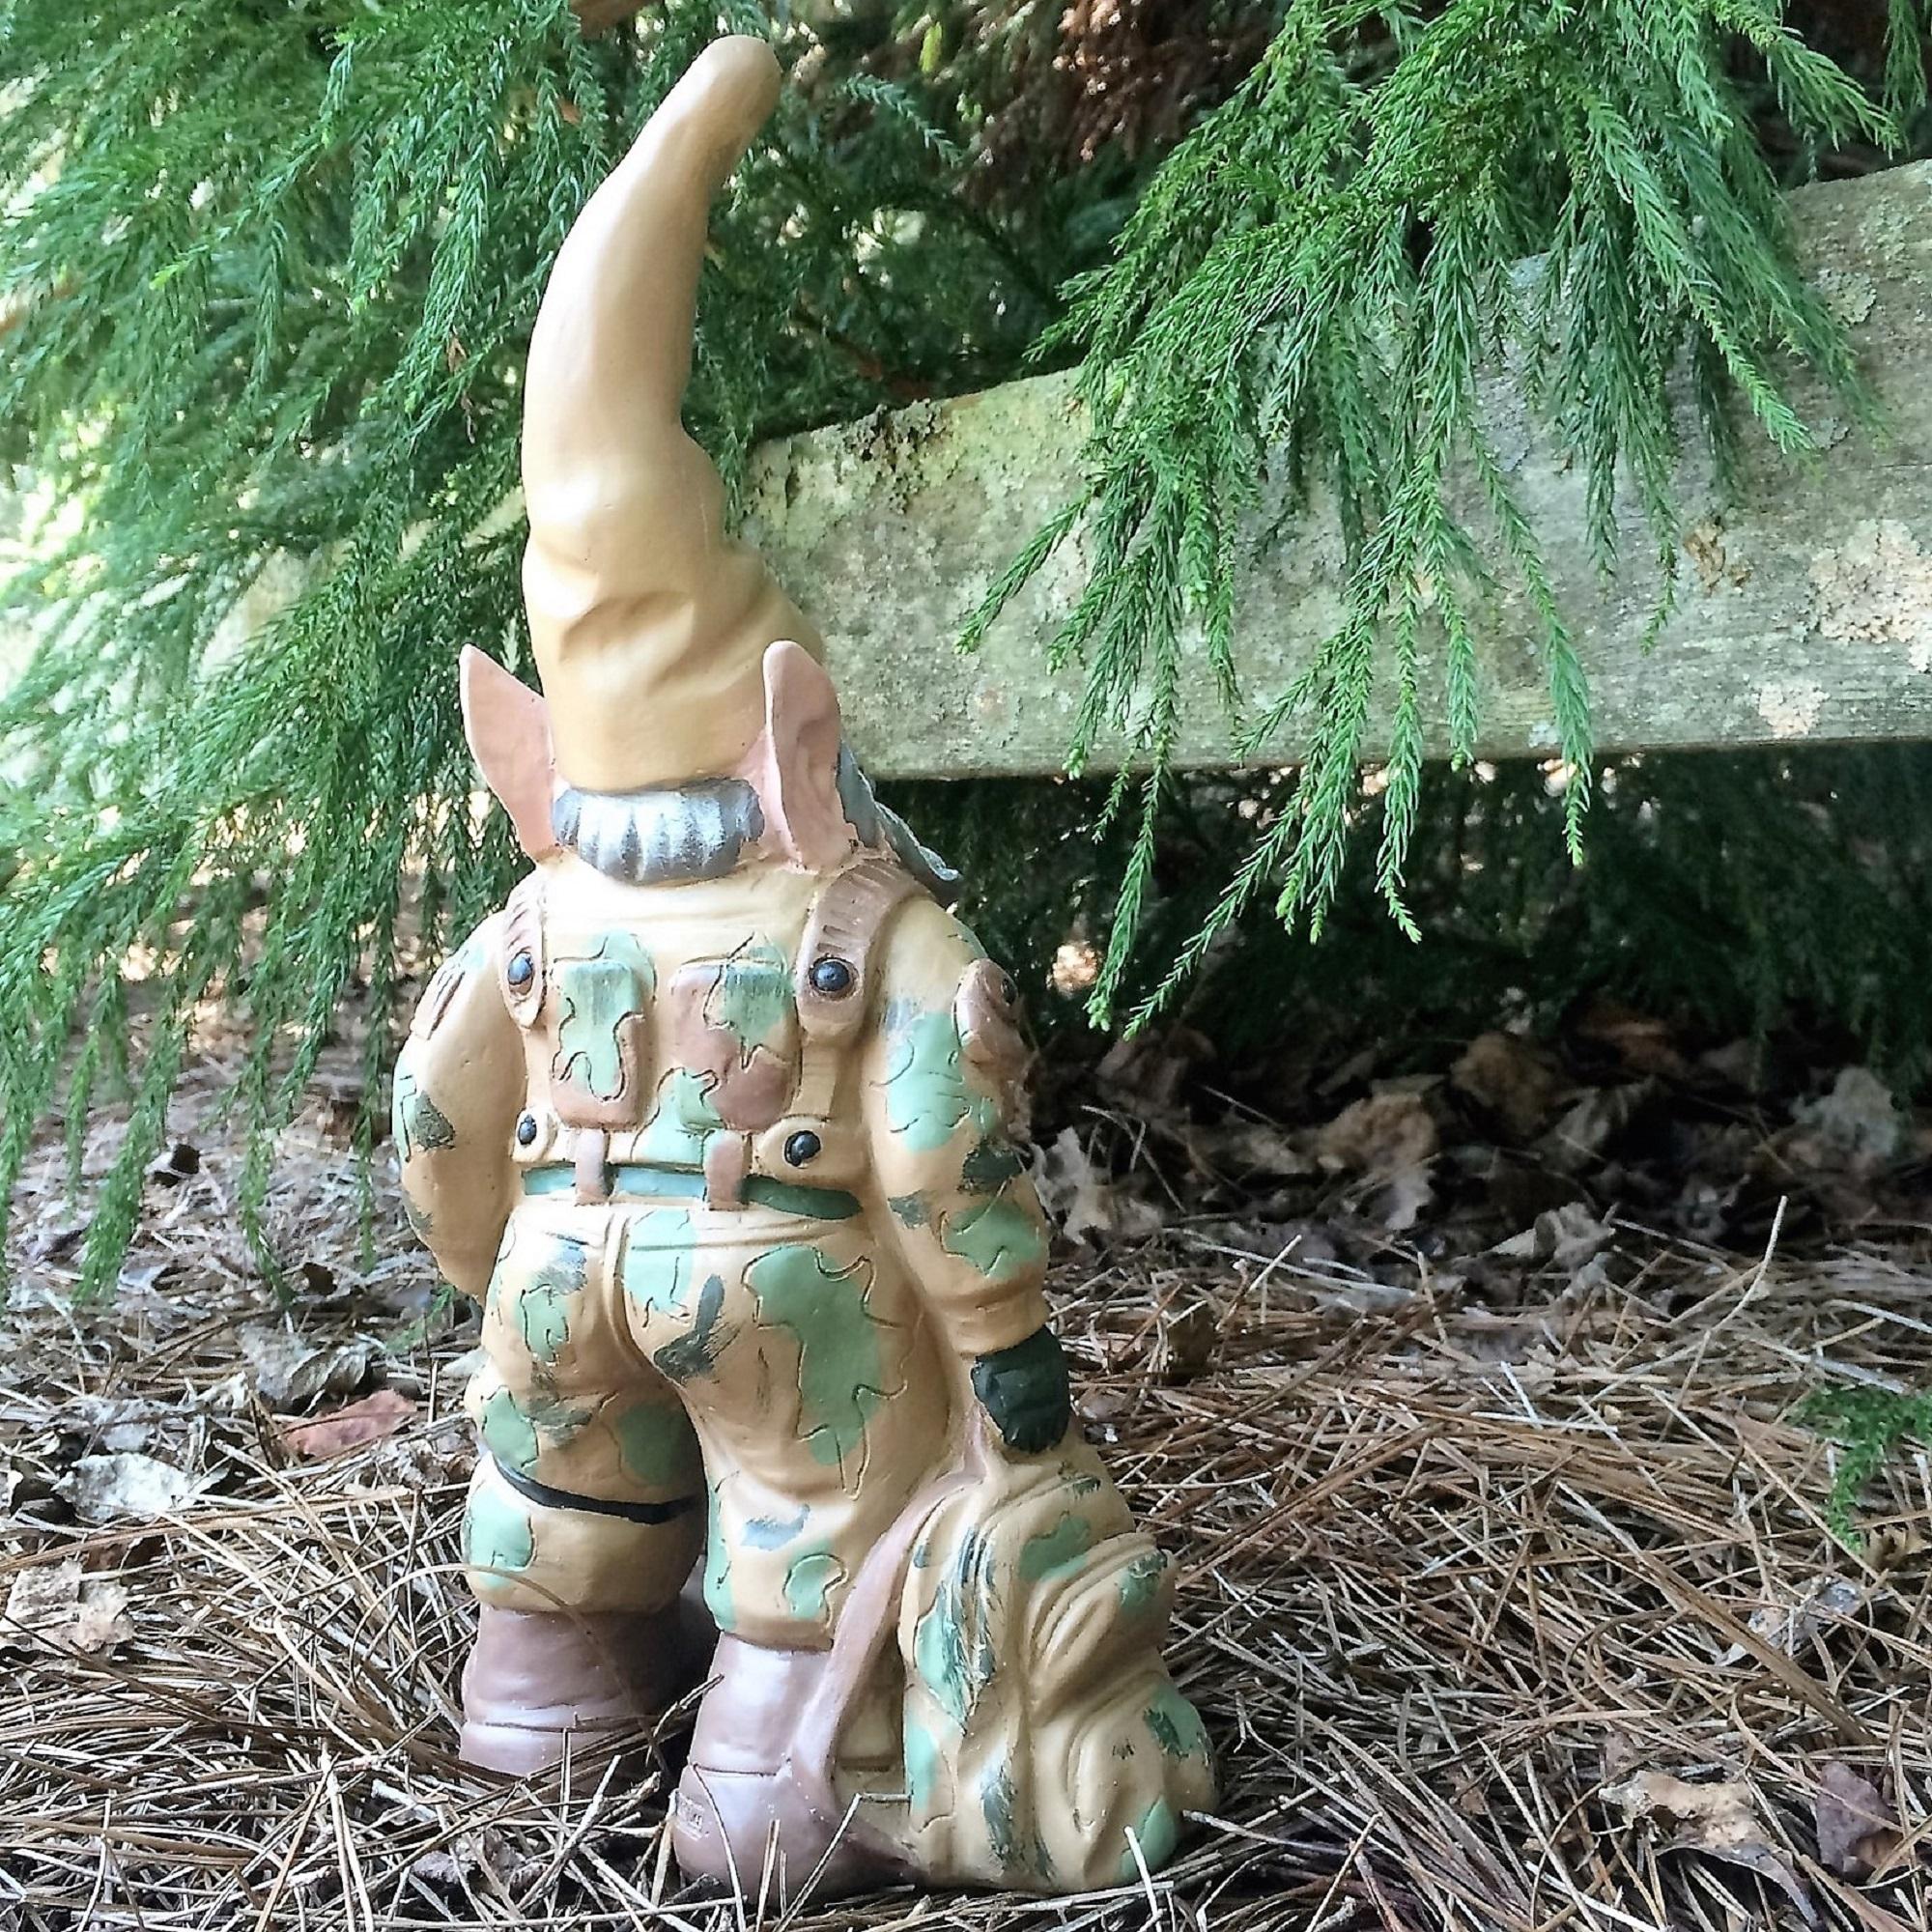 Homestyles Gi Joe Army Gnome American Military Solider In Fatigues Uniform Large Outdoor Garden Statue 15 H Walmart Com Walmart Com